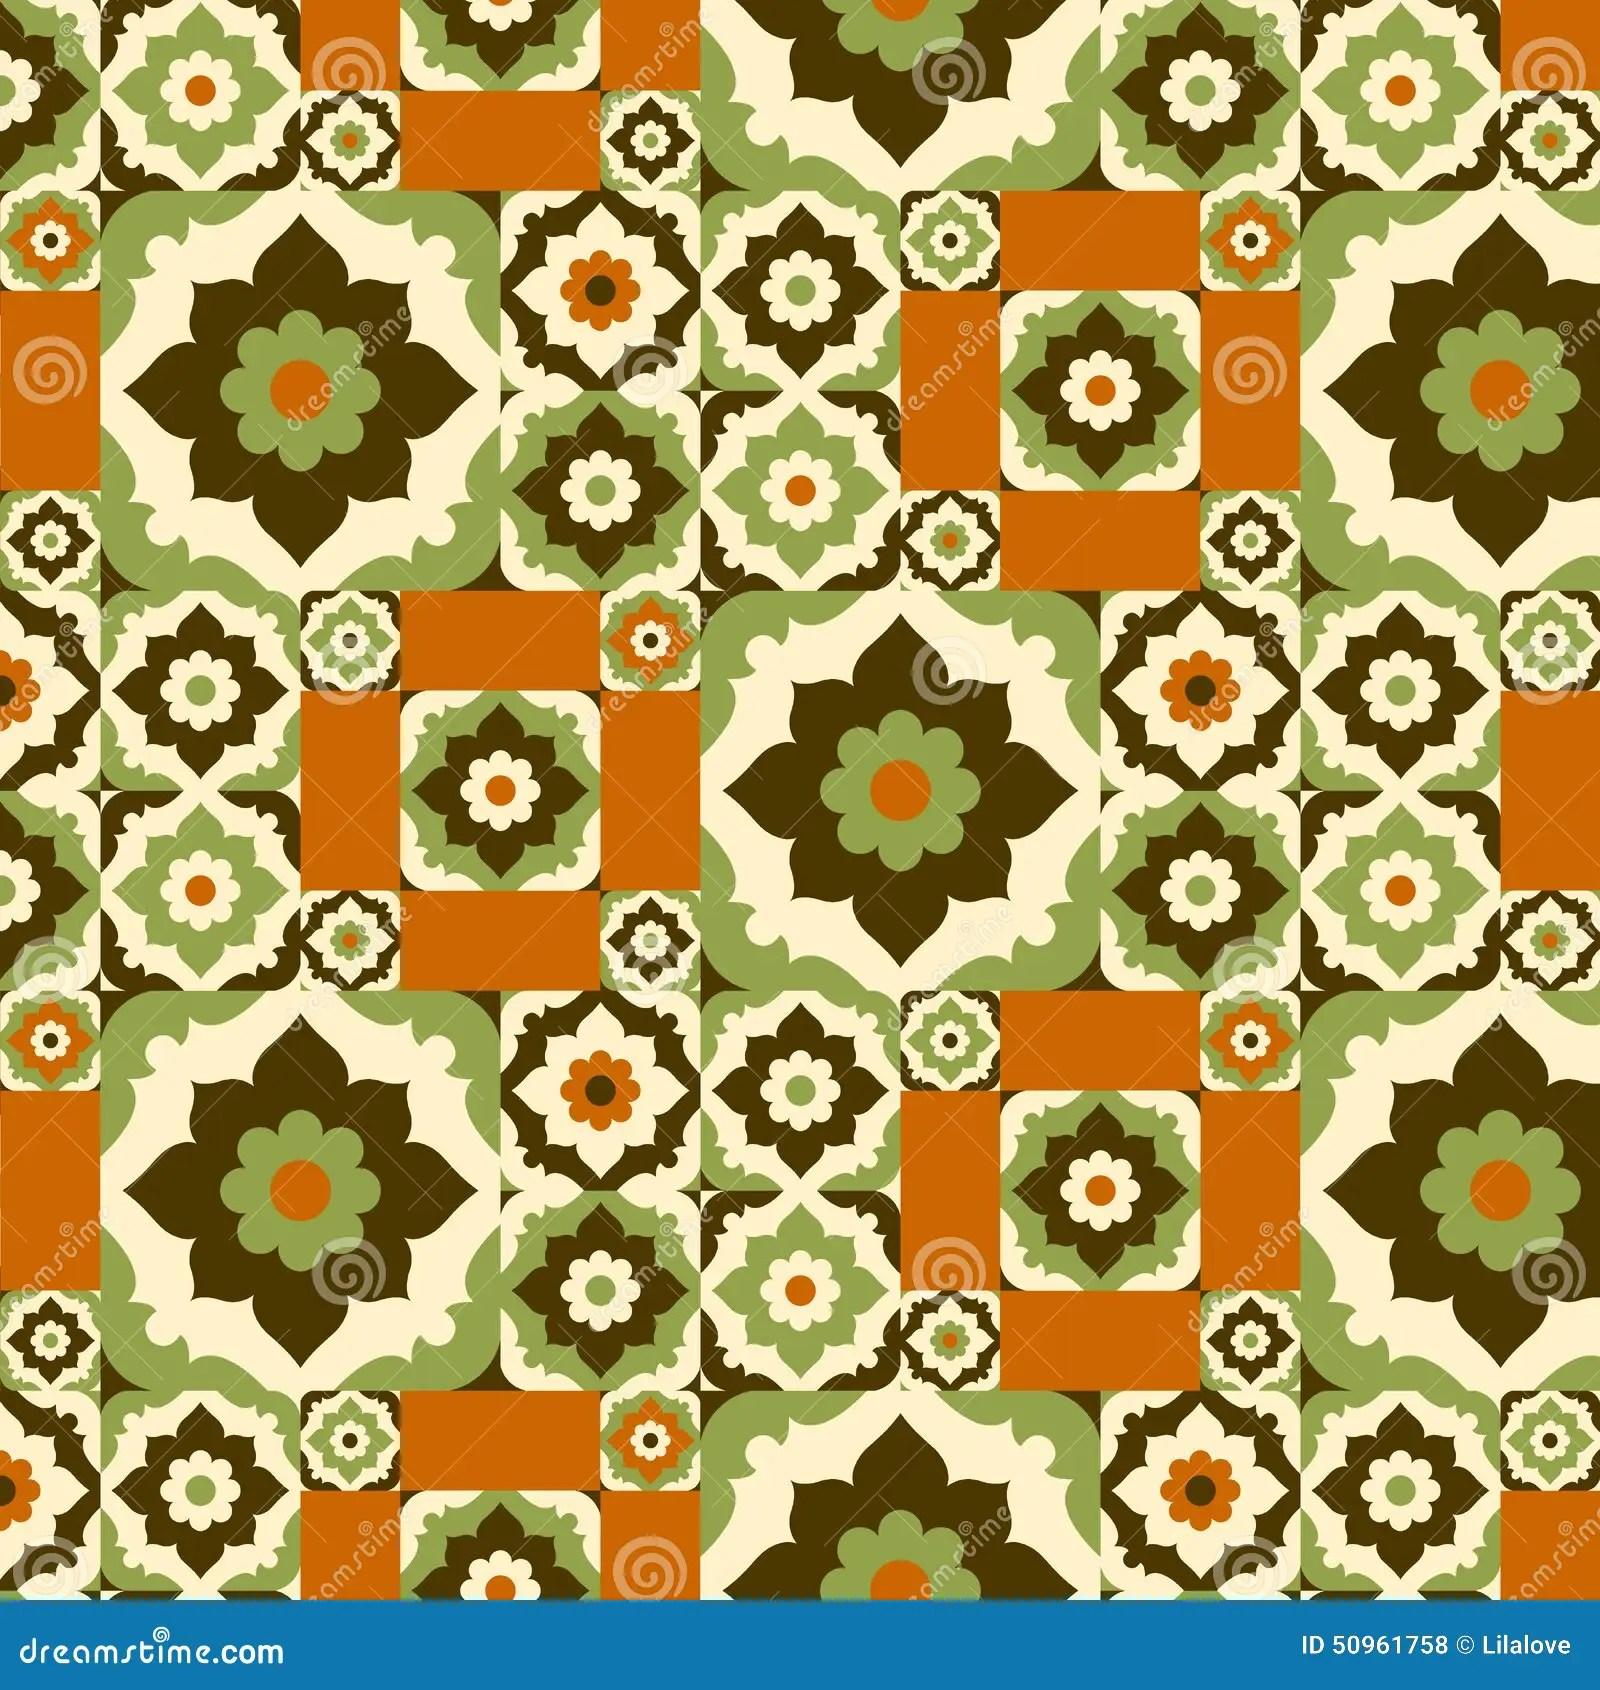 seamless pattern retro ceramic tile design with floral ornate stock vector illustration of circle orange 50961758